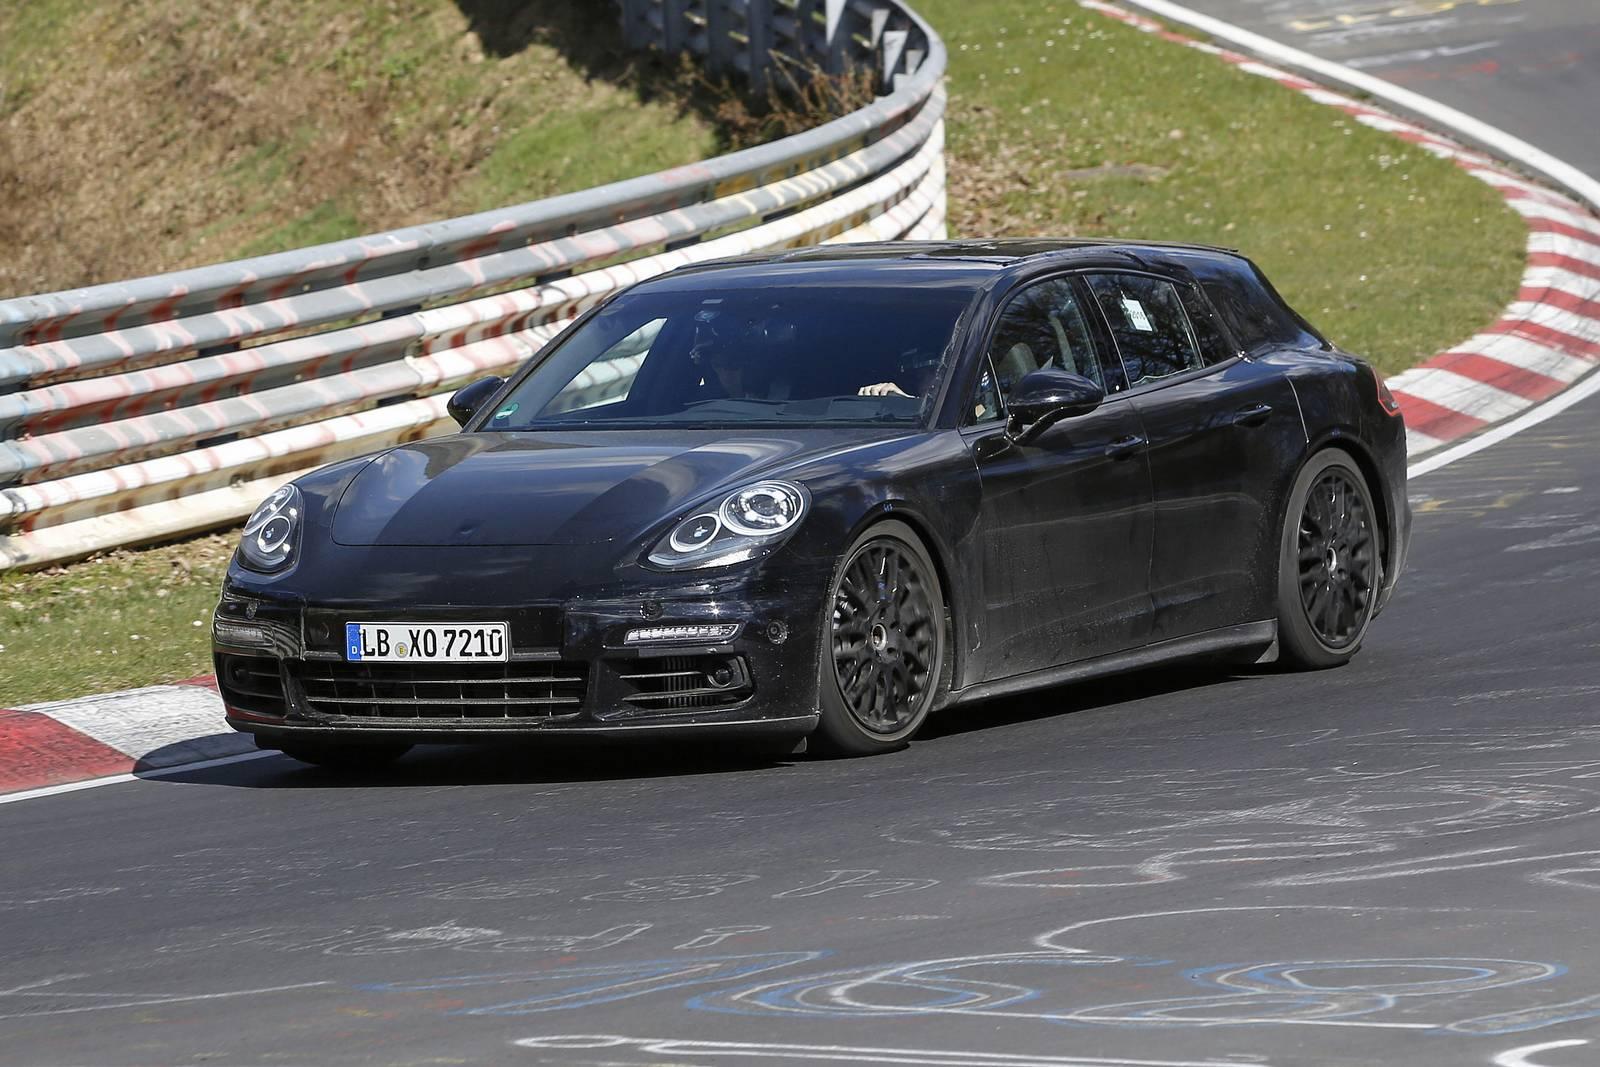 2018 porsche panamera shooting brake latest spy shots gtspirit -  2018 Porsche Panamera Shooting Brake Latest Spy Shots Supercar